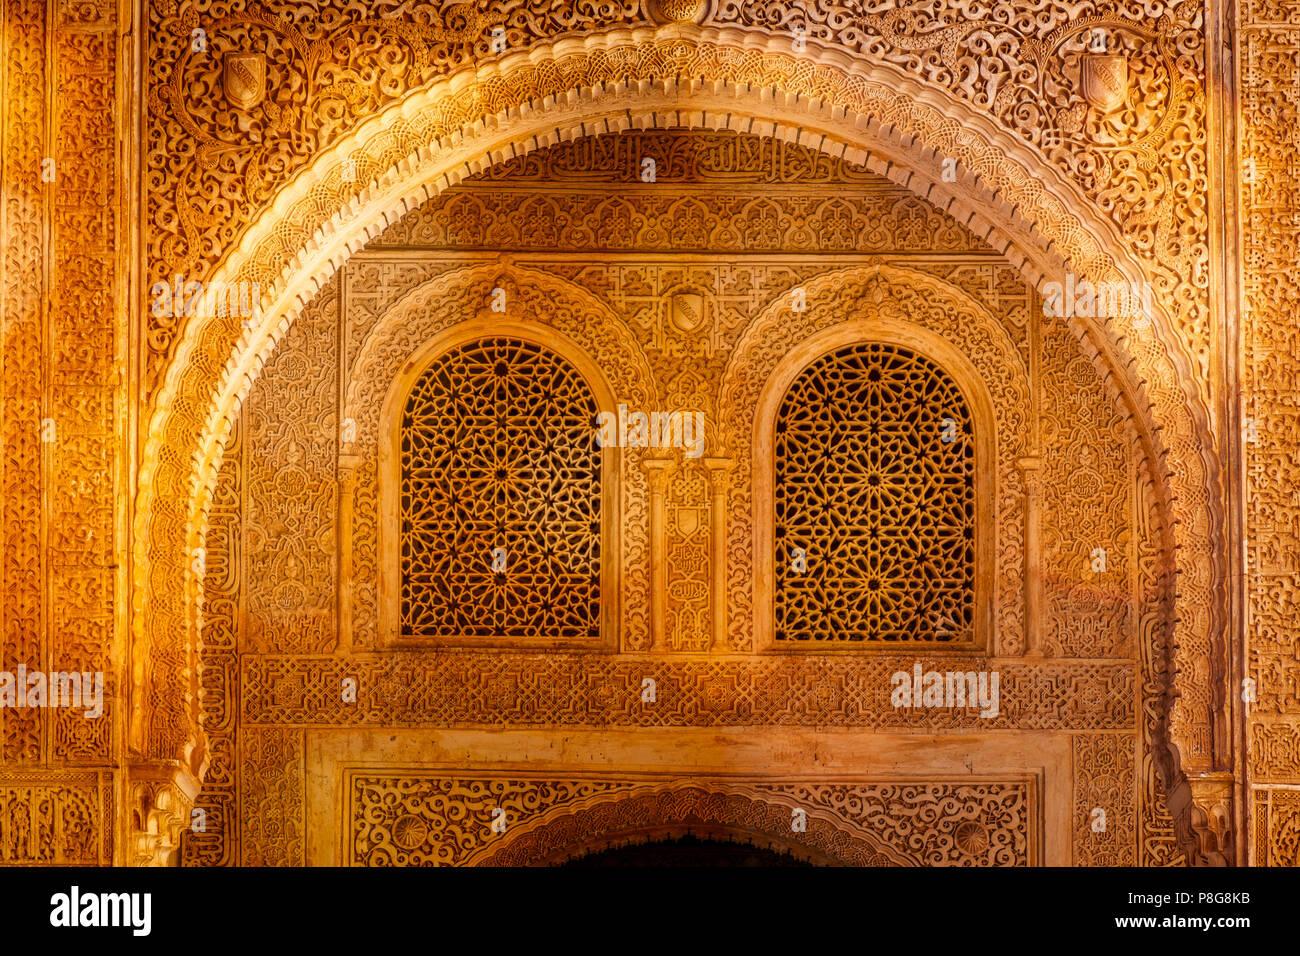 Palacios Nazaries. Nasrid Palace. Alhambra, UNESCO World Heritage Site. Granada City. Andalusia, Southern Spain Europe Stock Photo